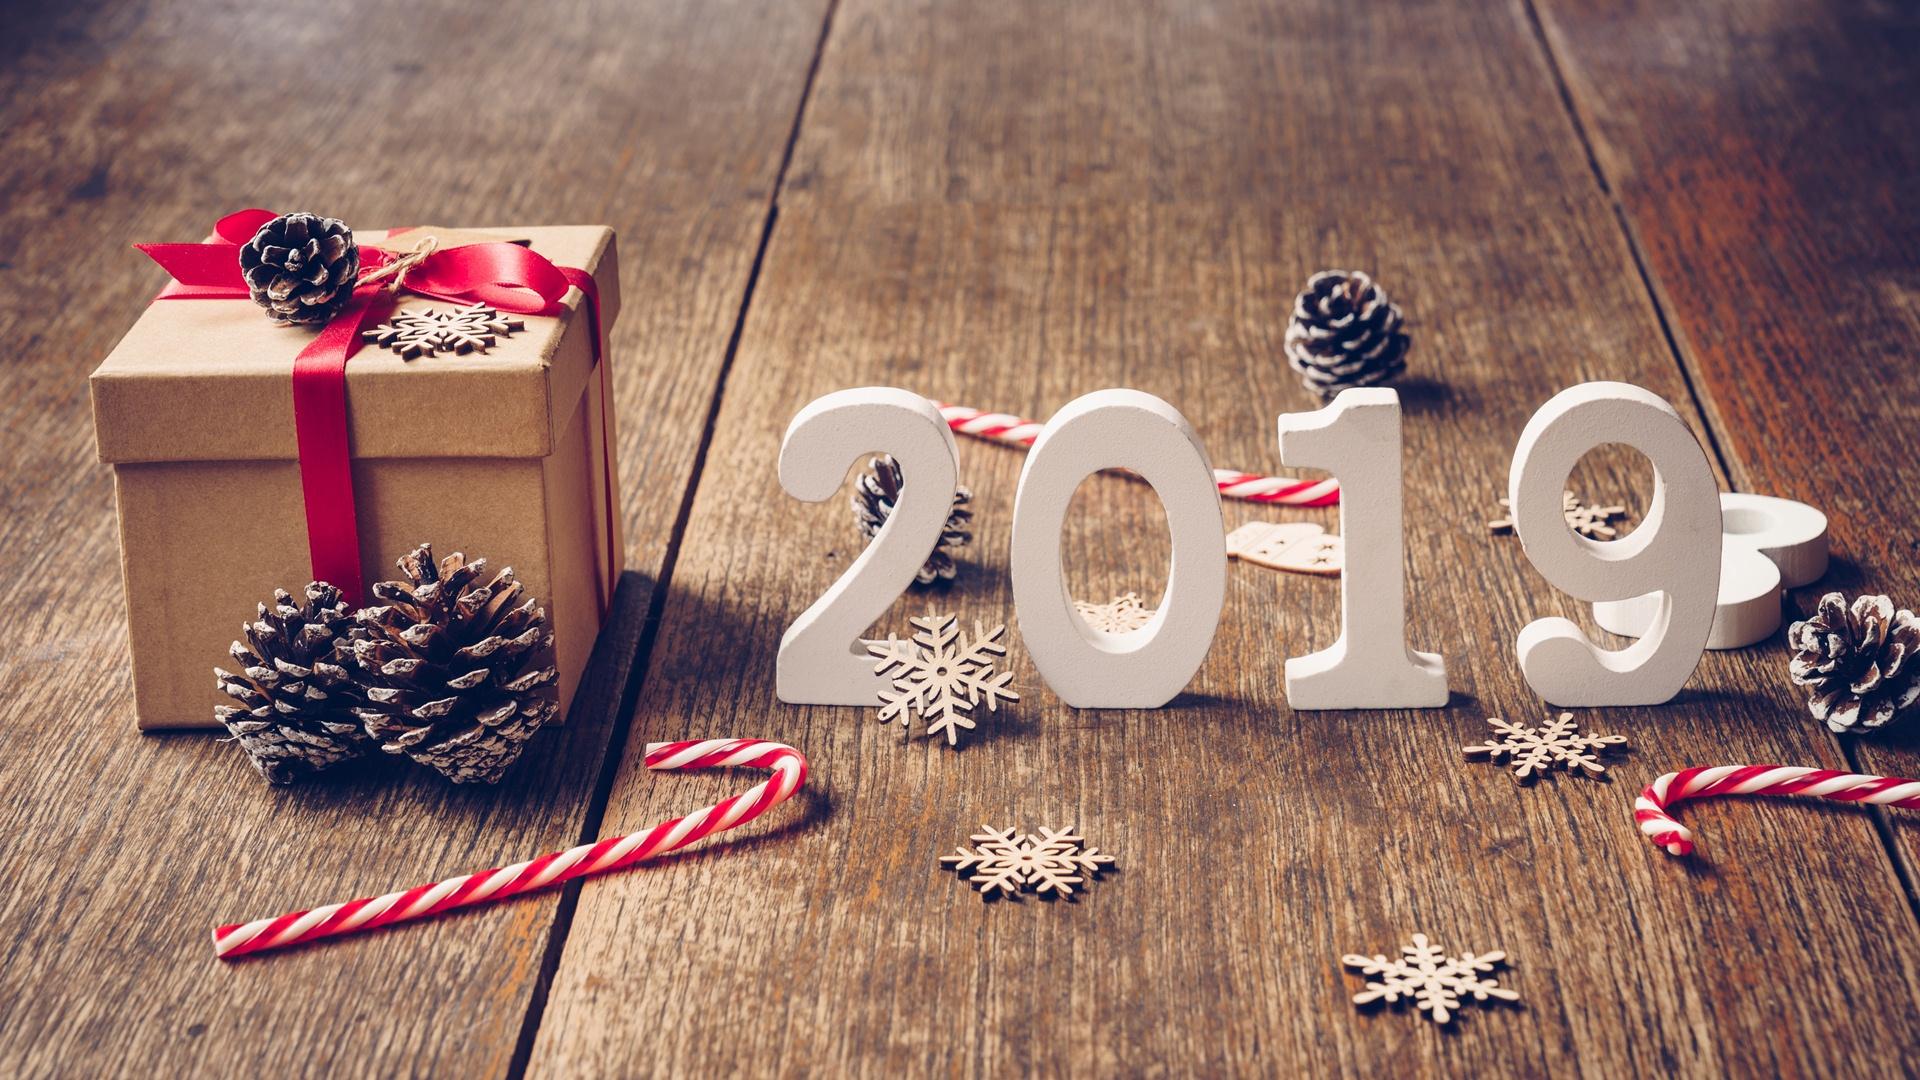 2019 Happy New Year Wallpaper HD